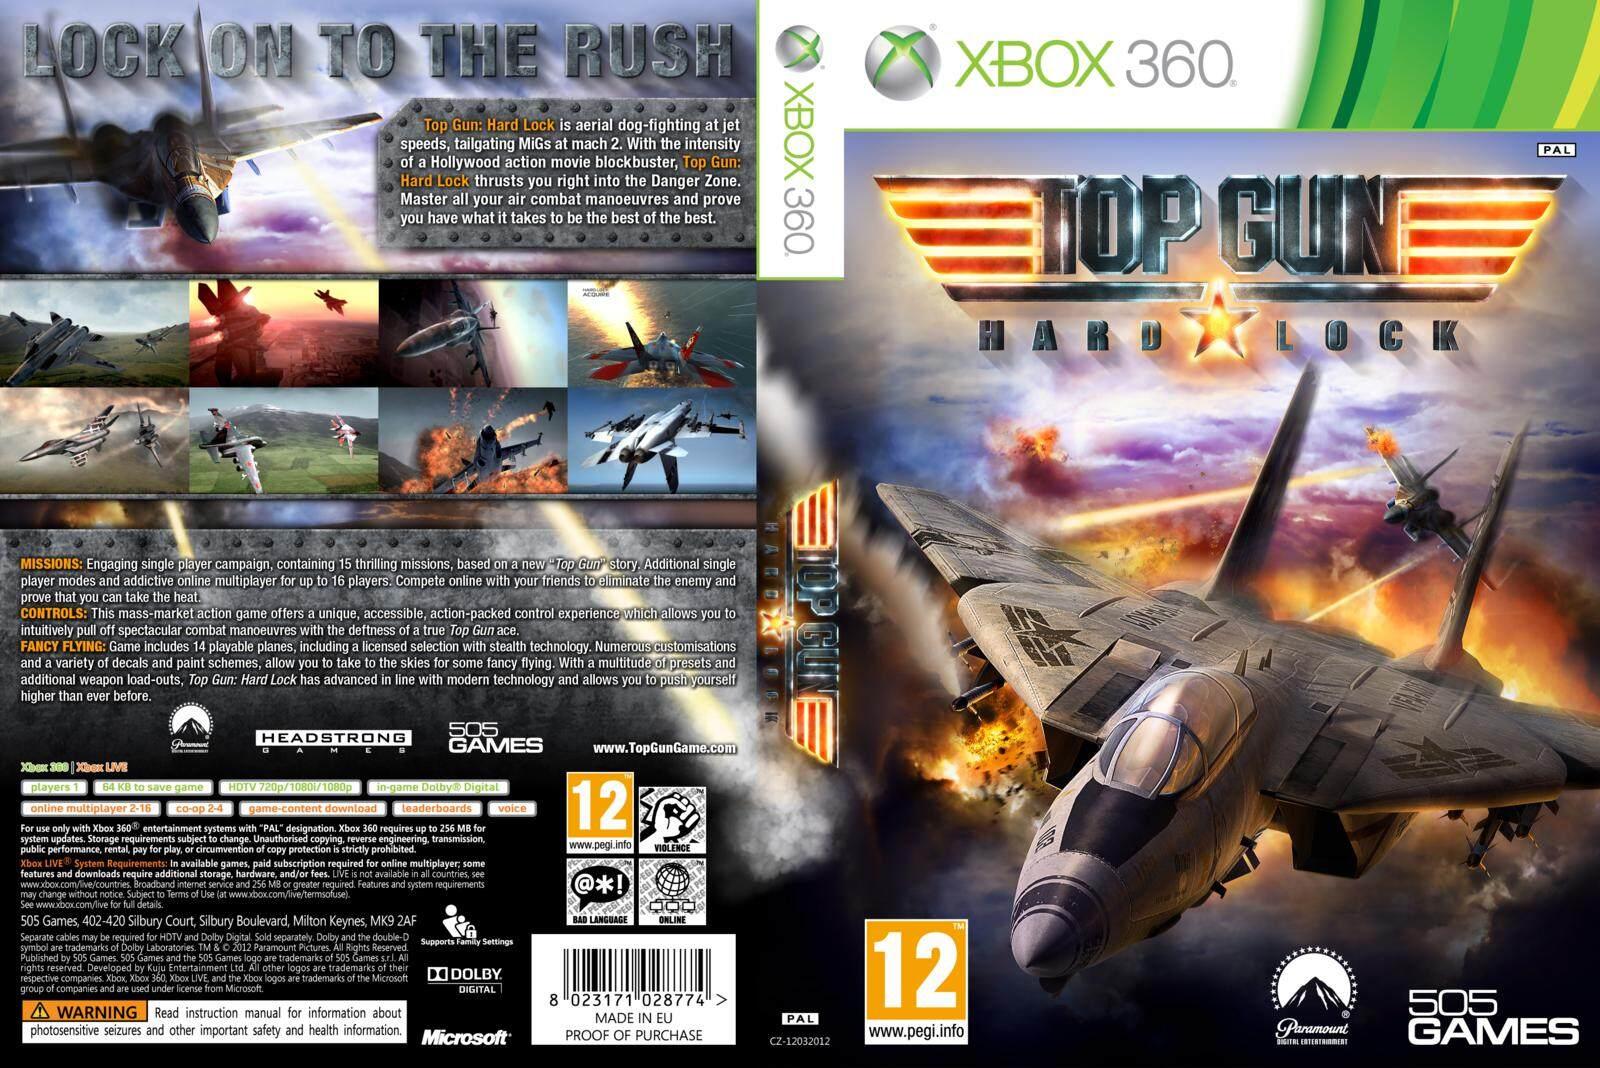 XBOX 360 Top Gun Hard Lock